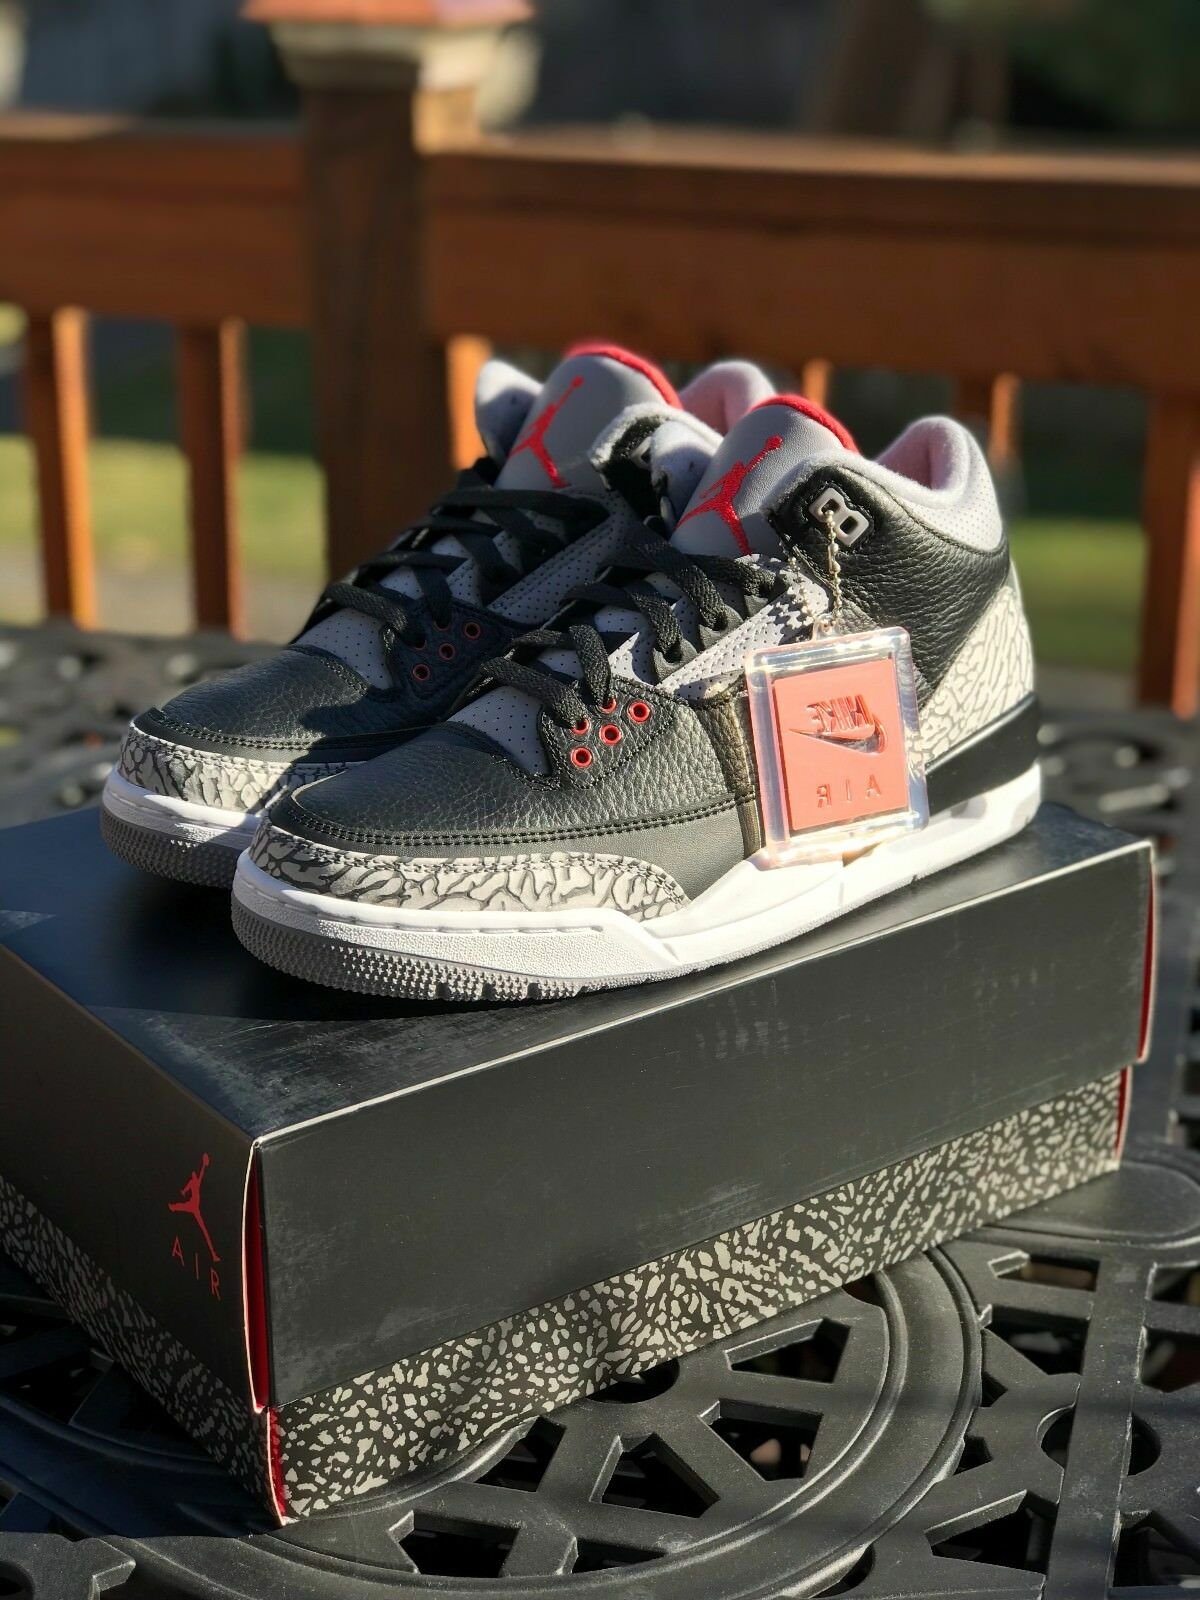 Nike Air Jordan 3 Black Cement Retro III OG